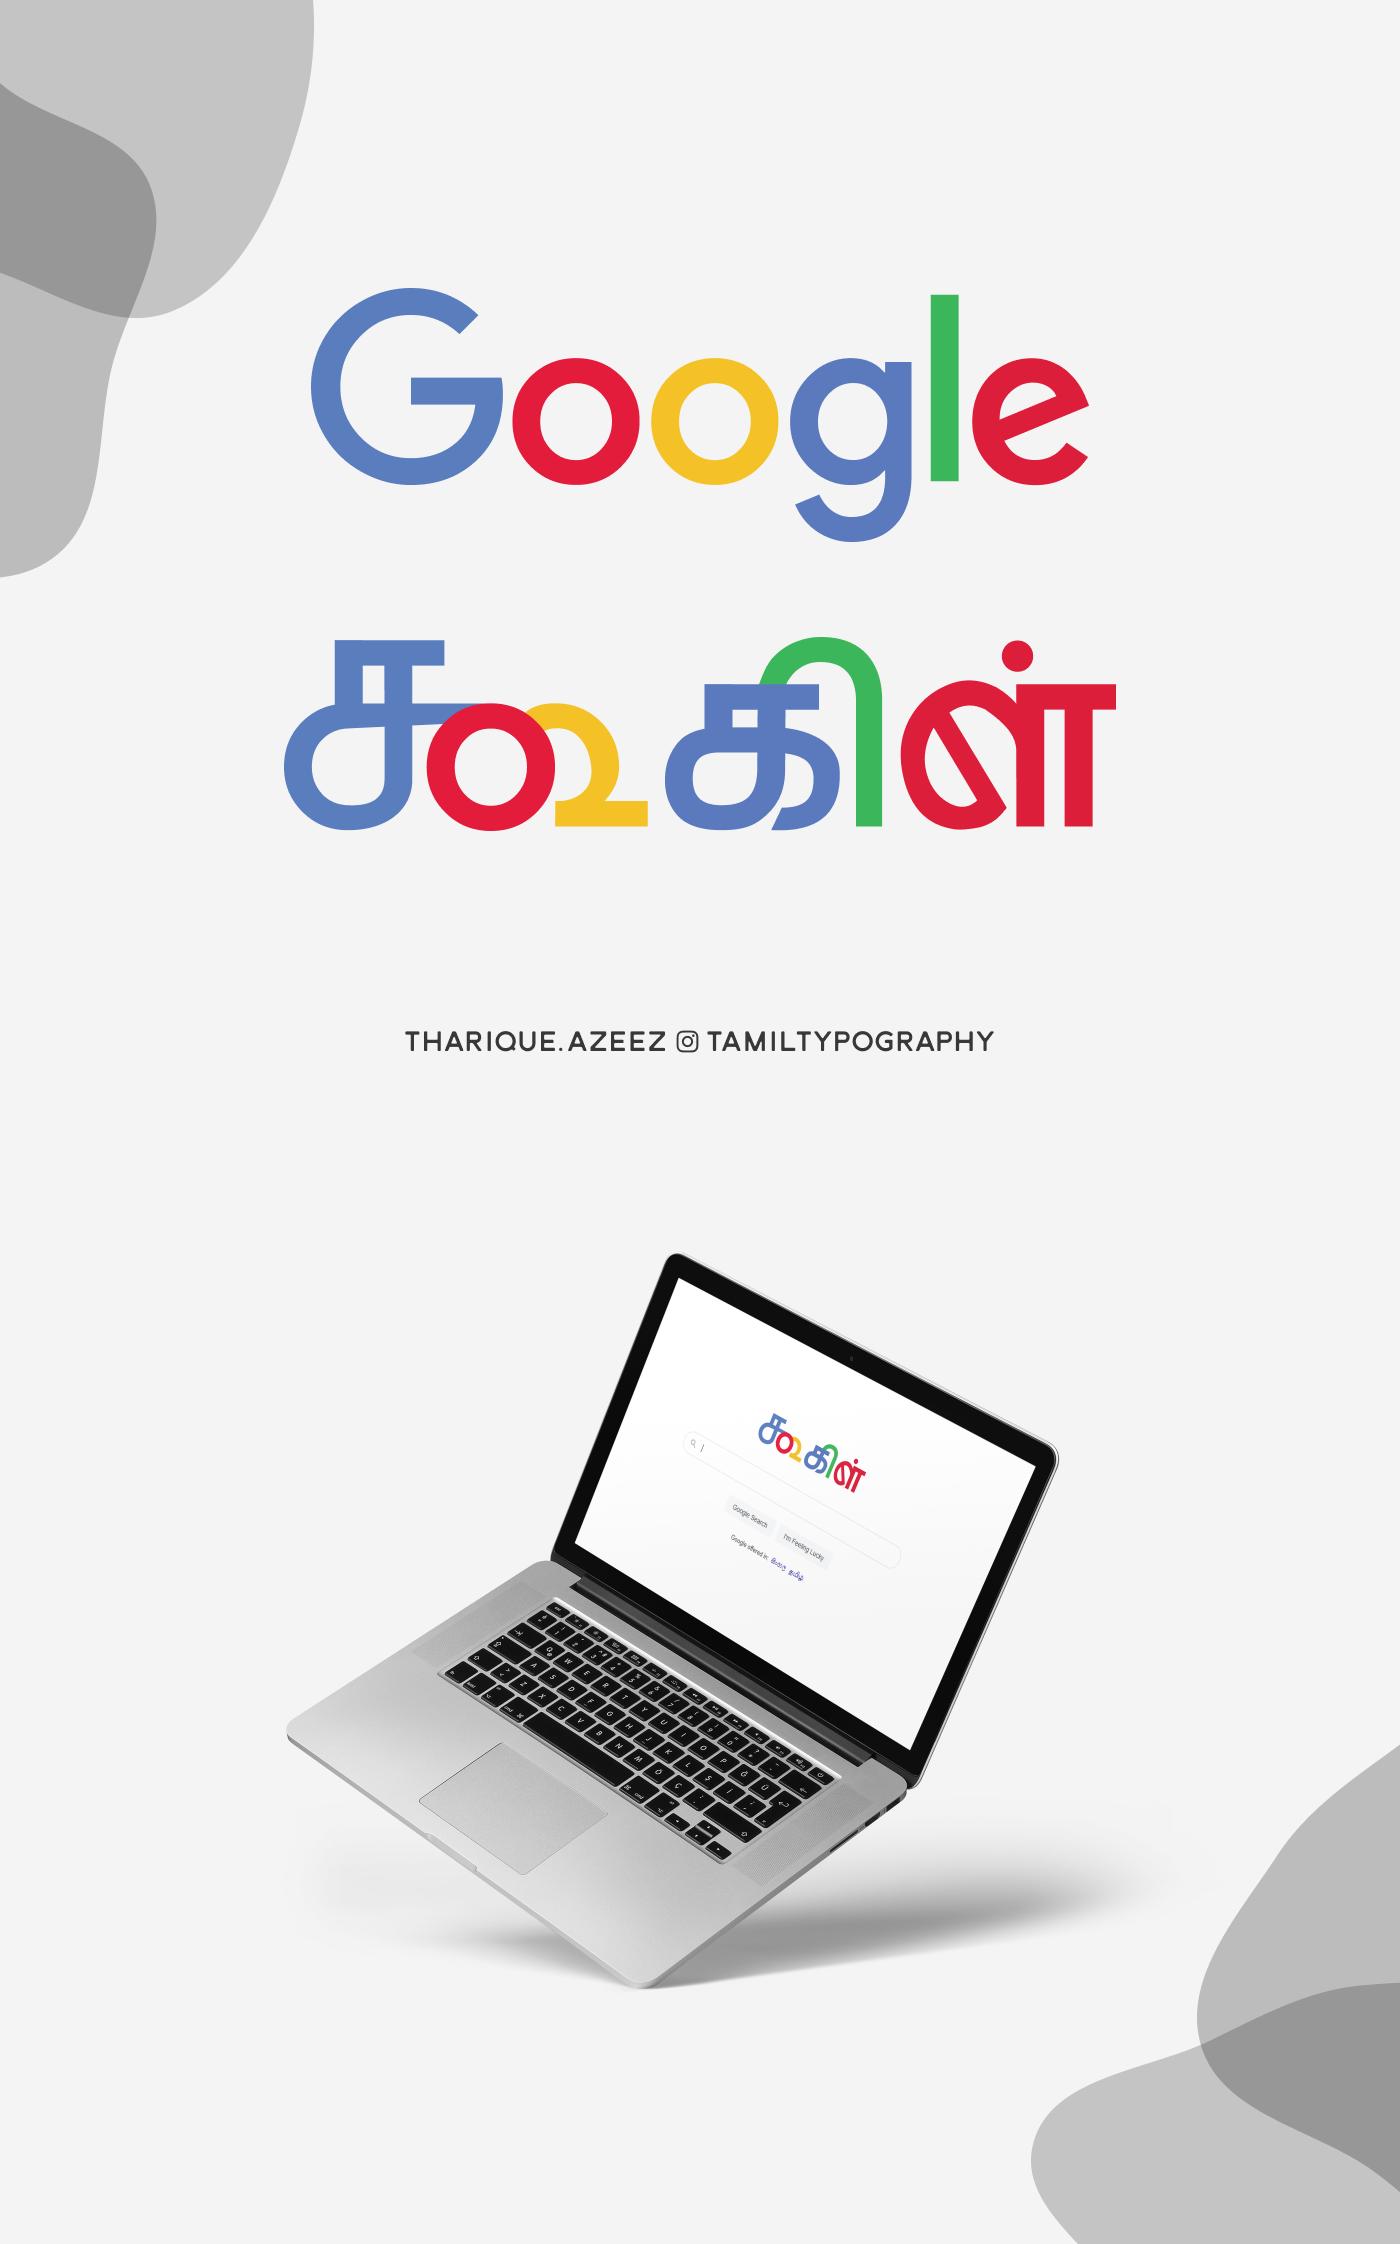 bilingual logo brand identity design google logos Logotype modern tamil tamilfont tamiltypography